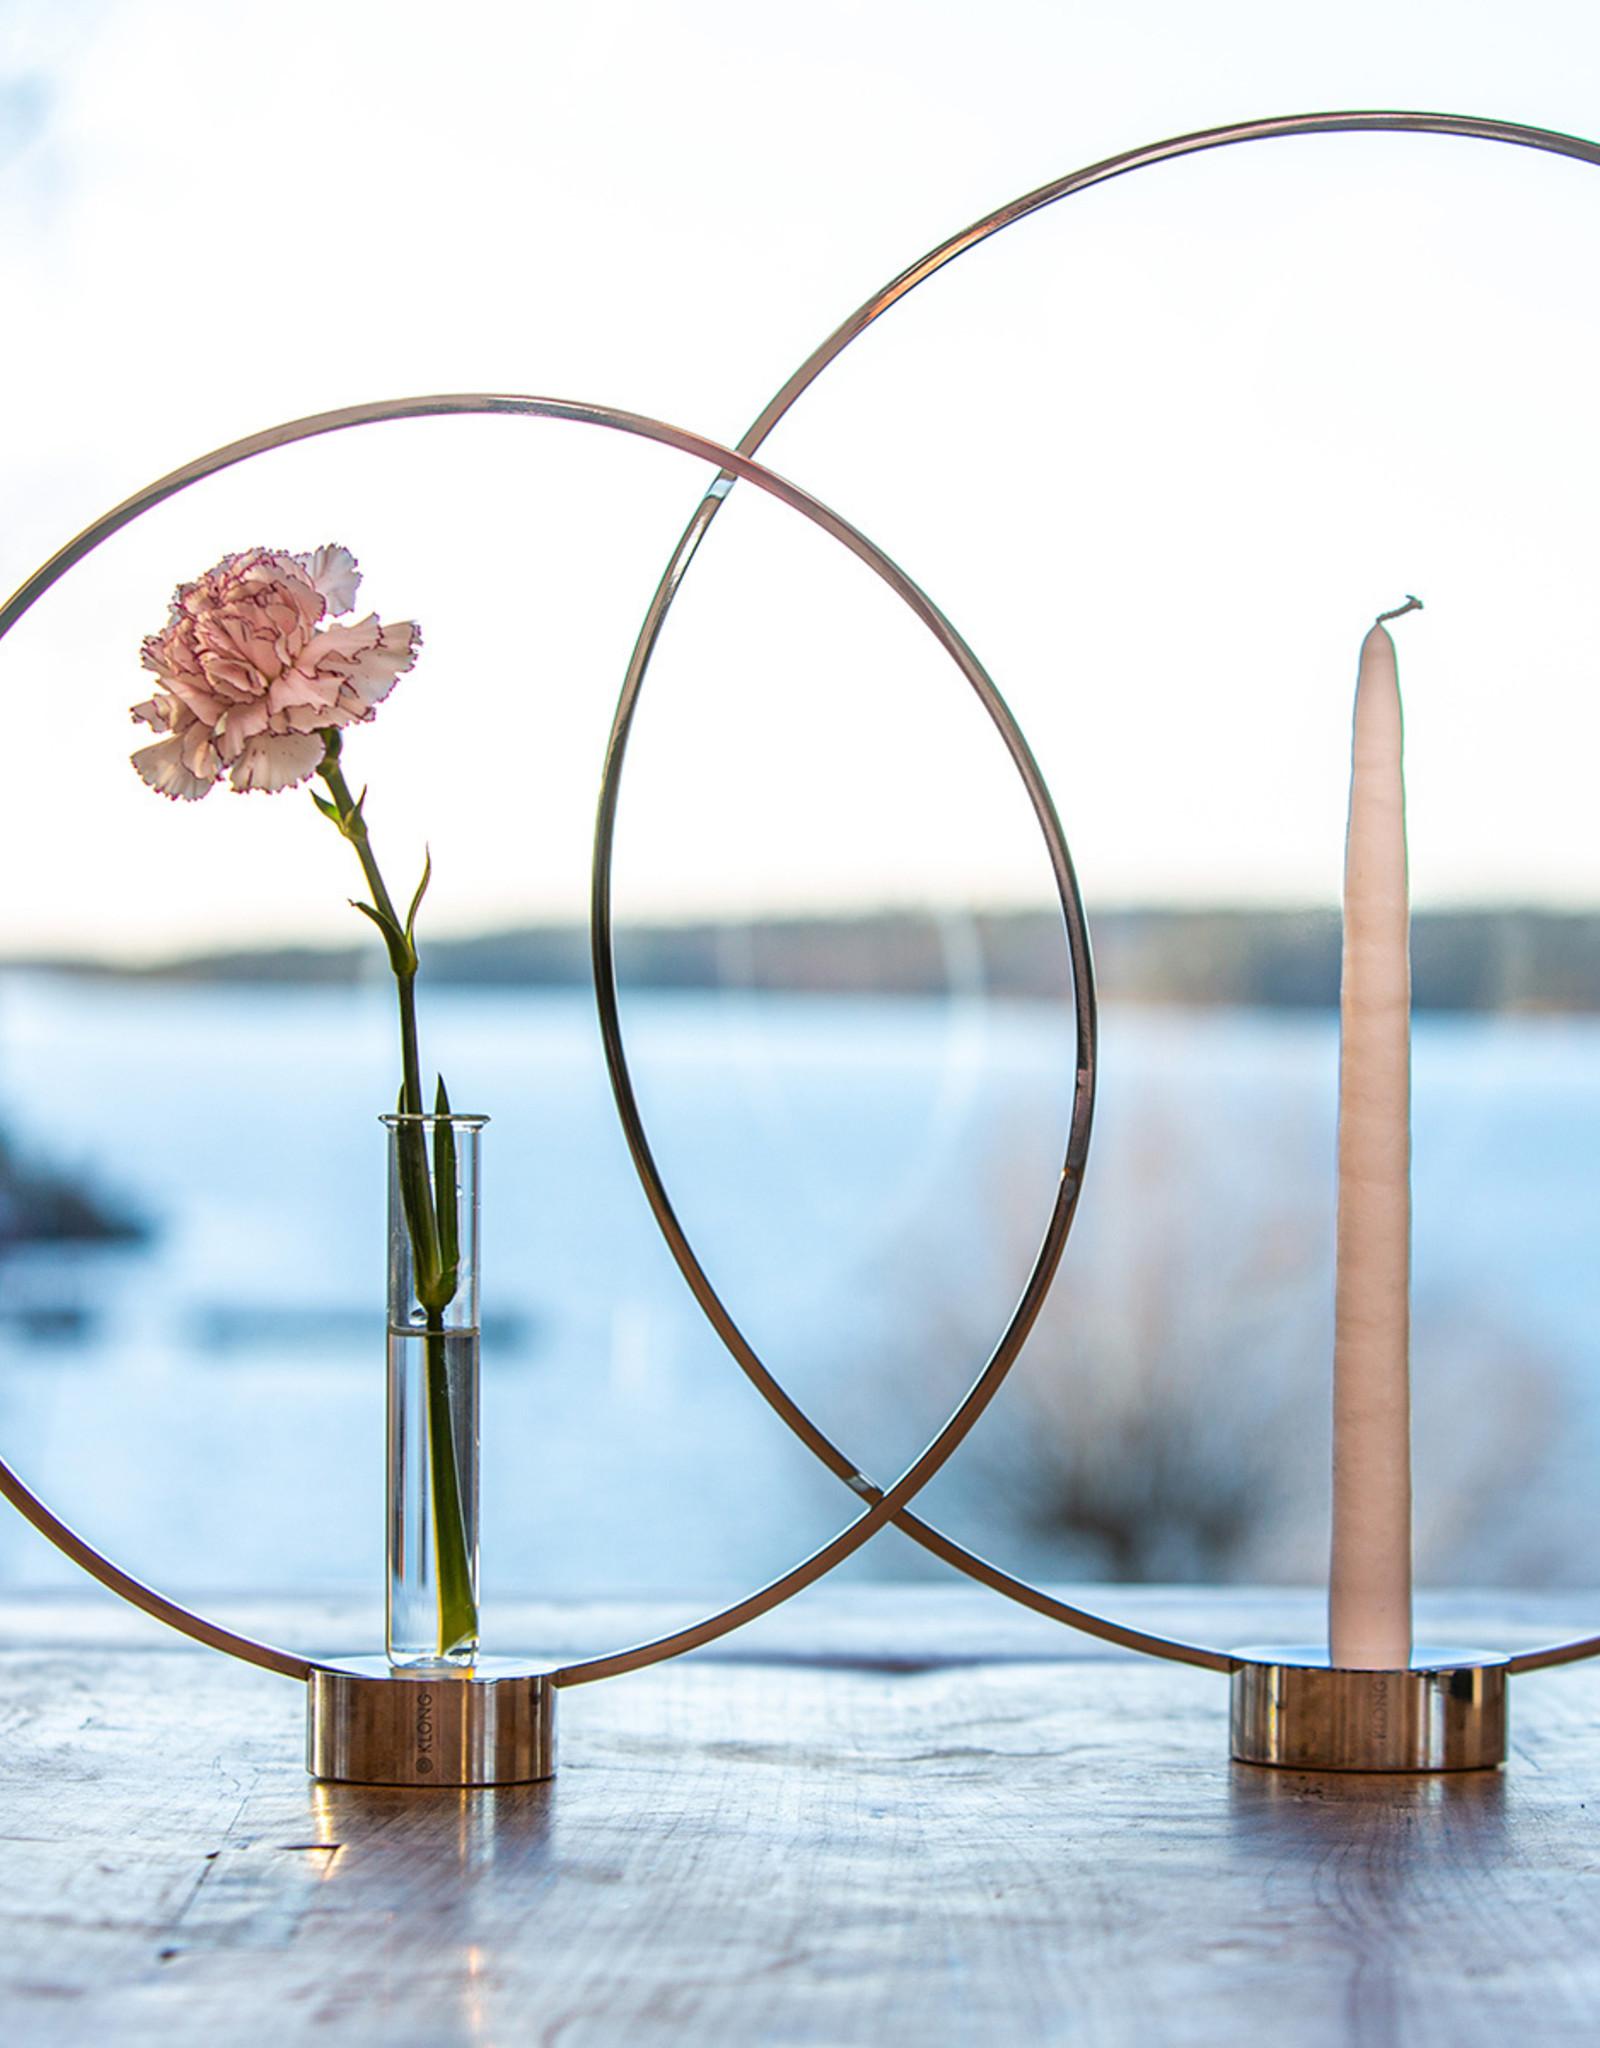 Gloria Ring by Mats Broberg and Johan Ridderstråle | Nickel | S